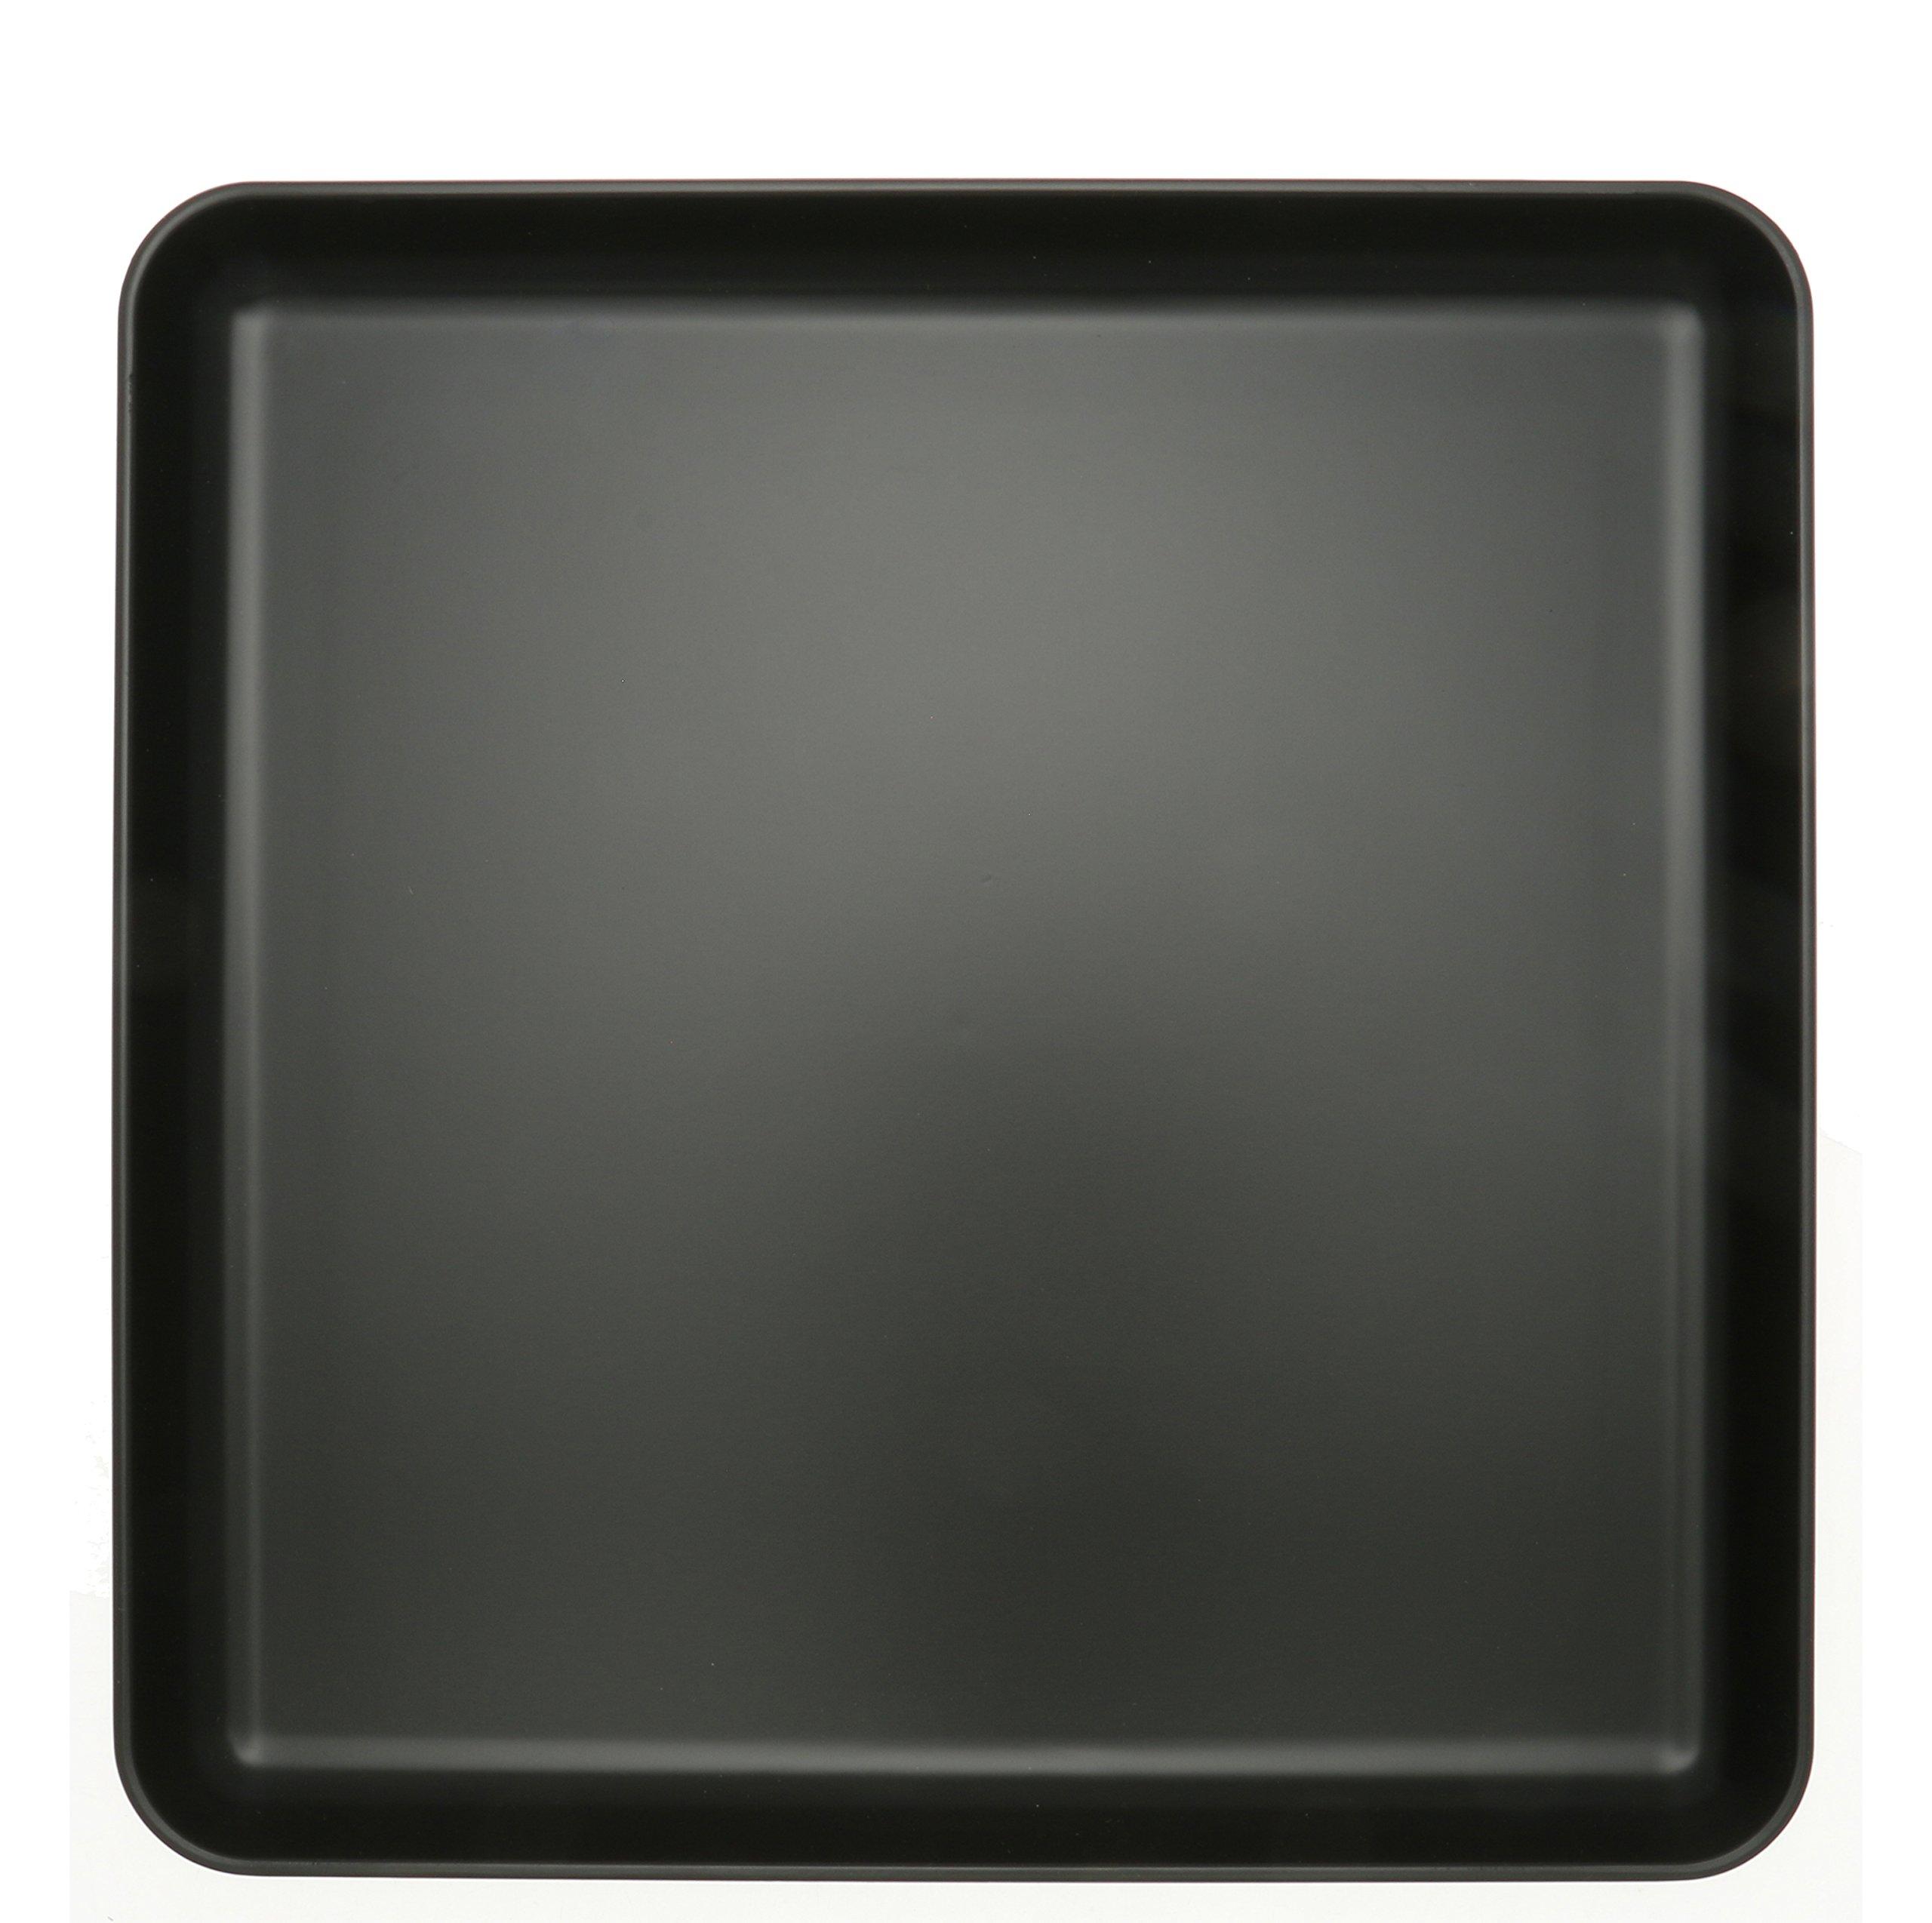 Kotobuki 270-956 Square Non-Slip Serving Tray, 13'', Black